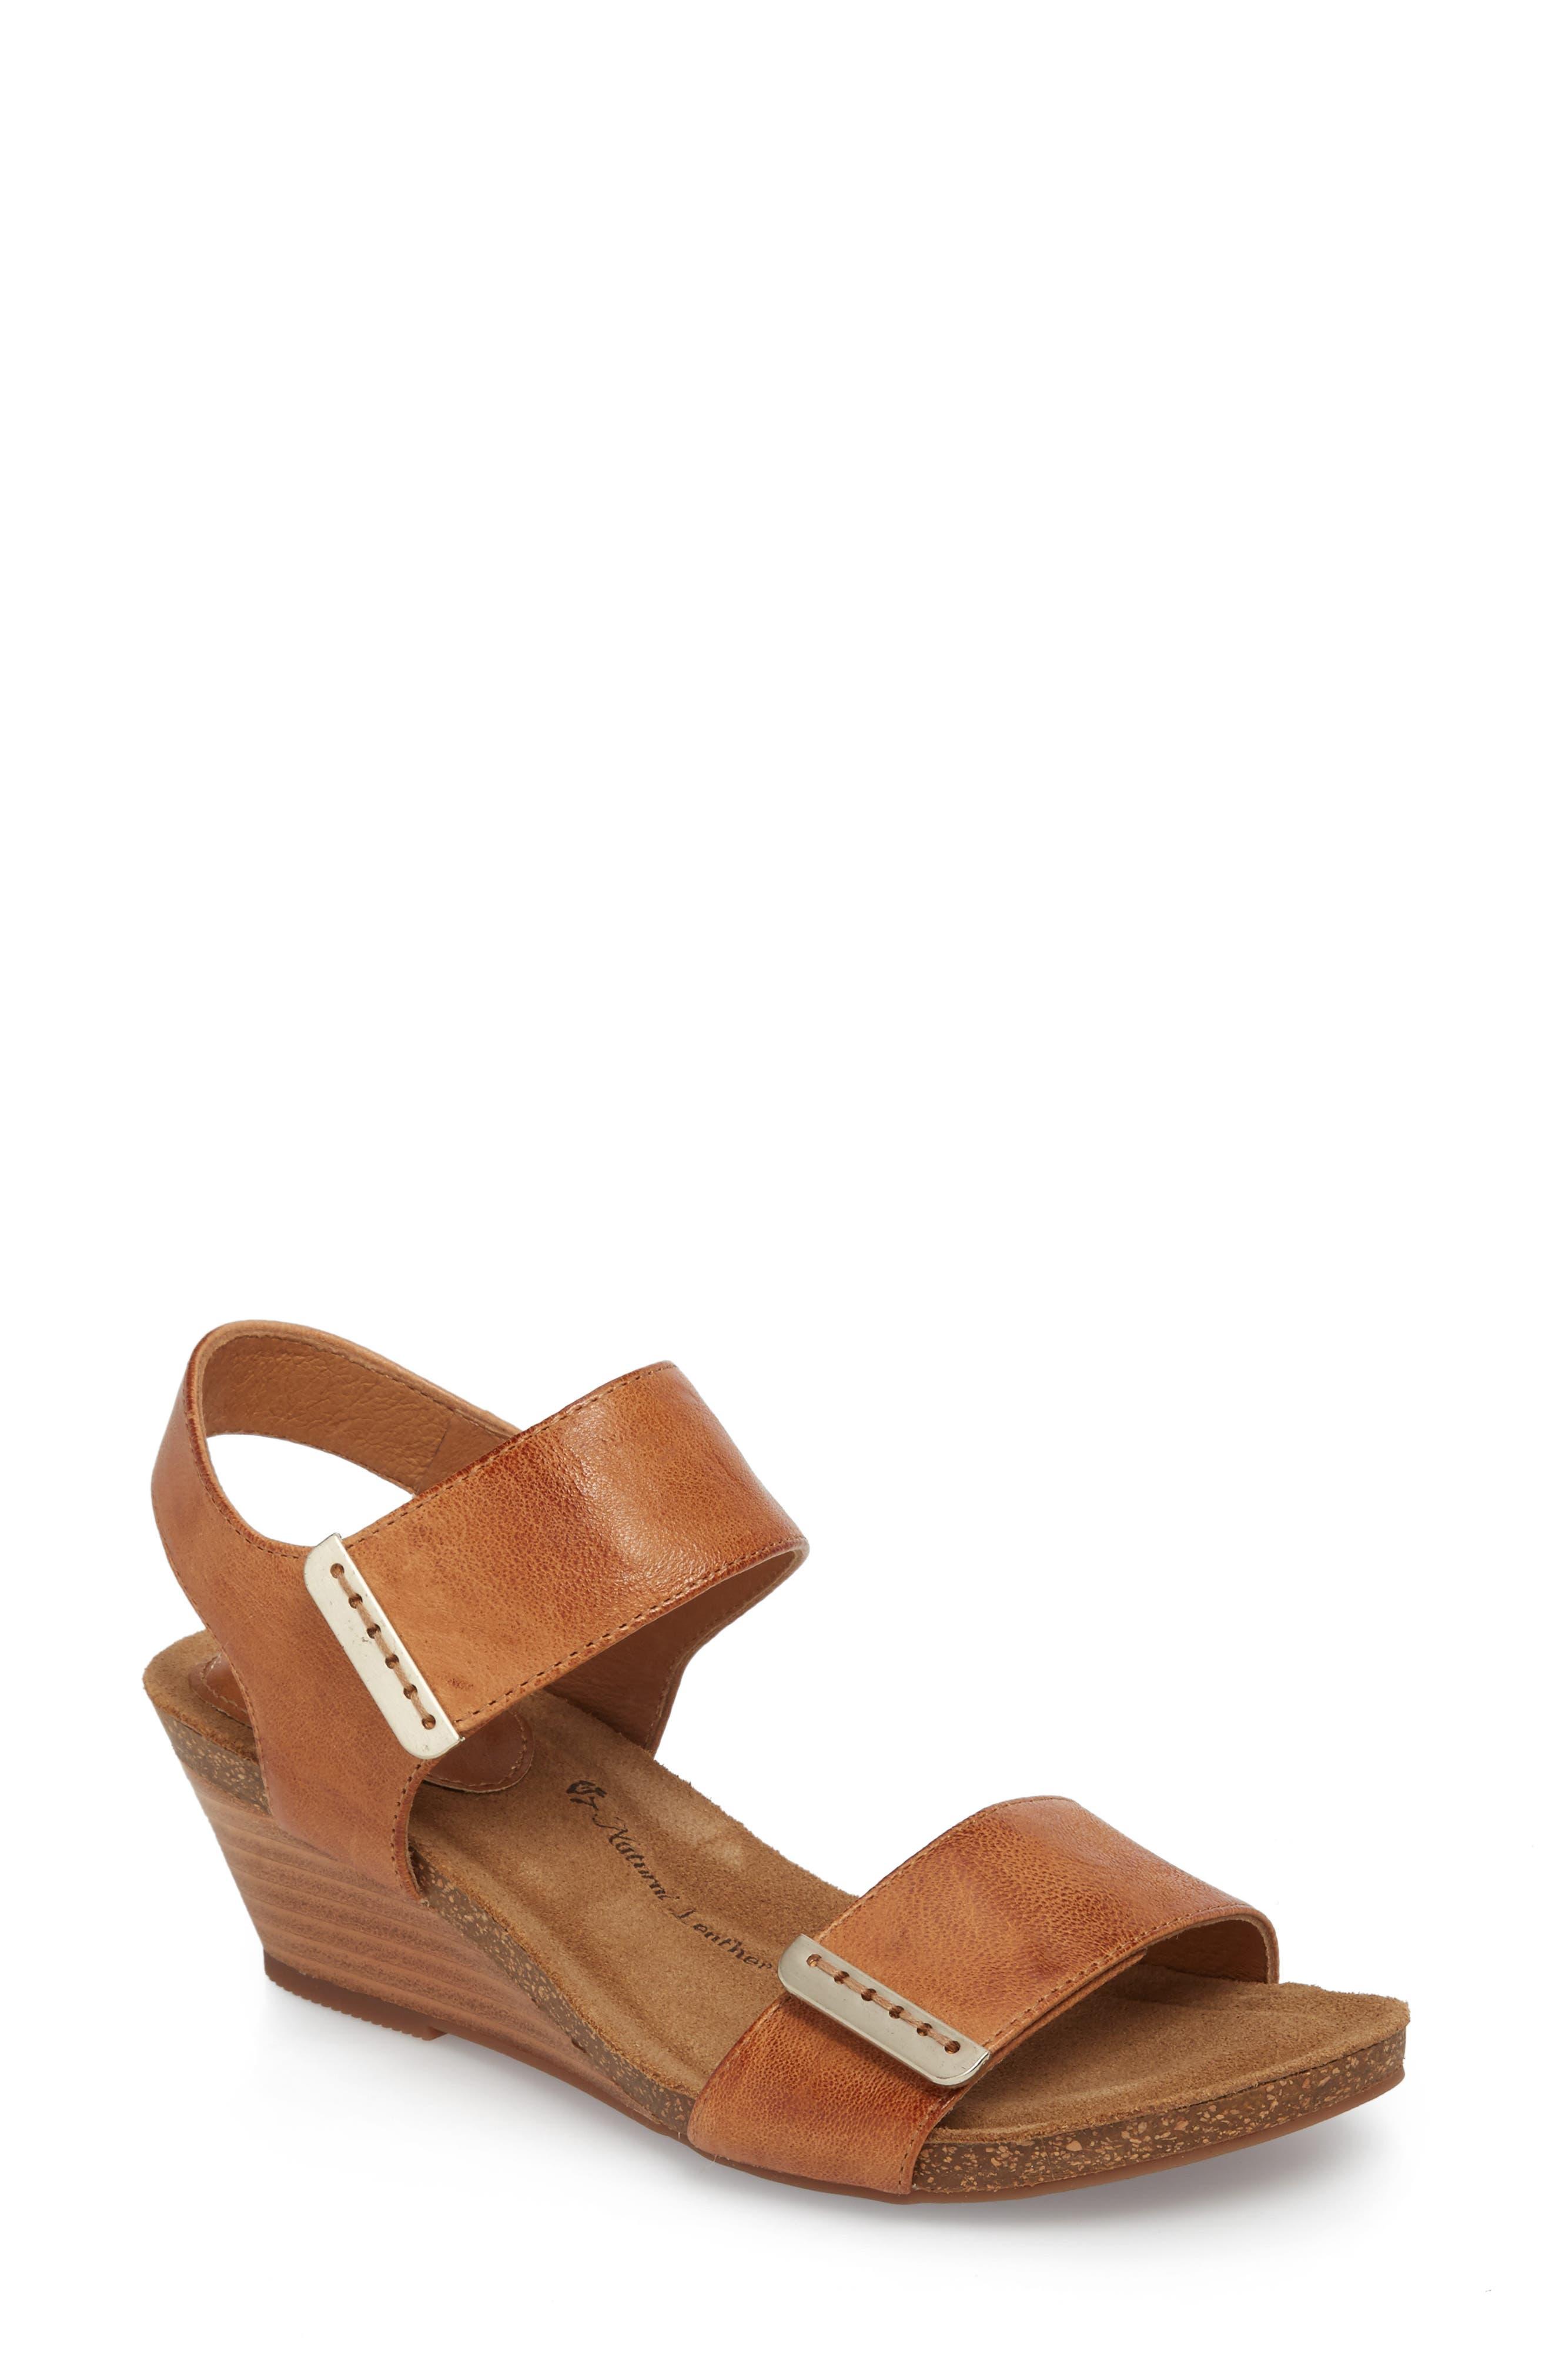 Verdi Wedge Sandal,                         Main,                         color, Luggage Leather